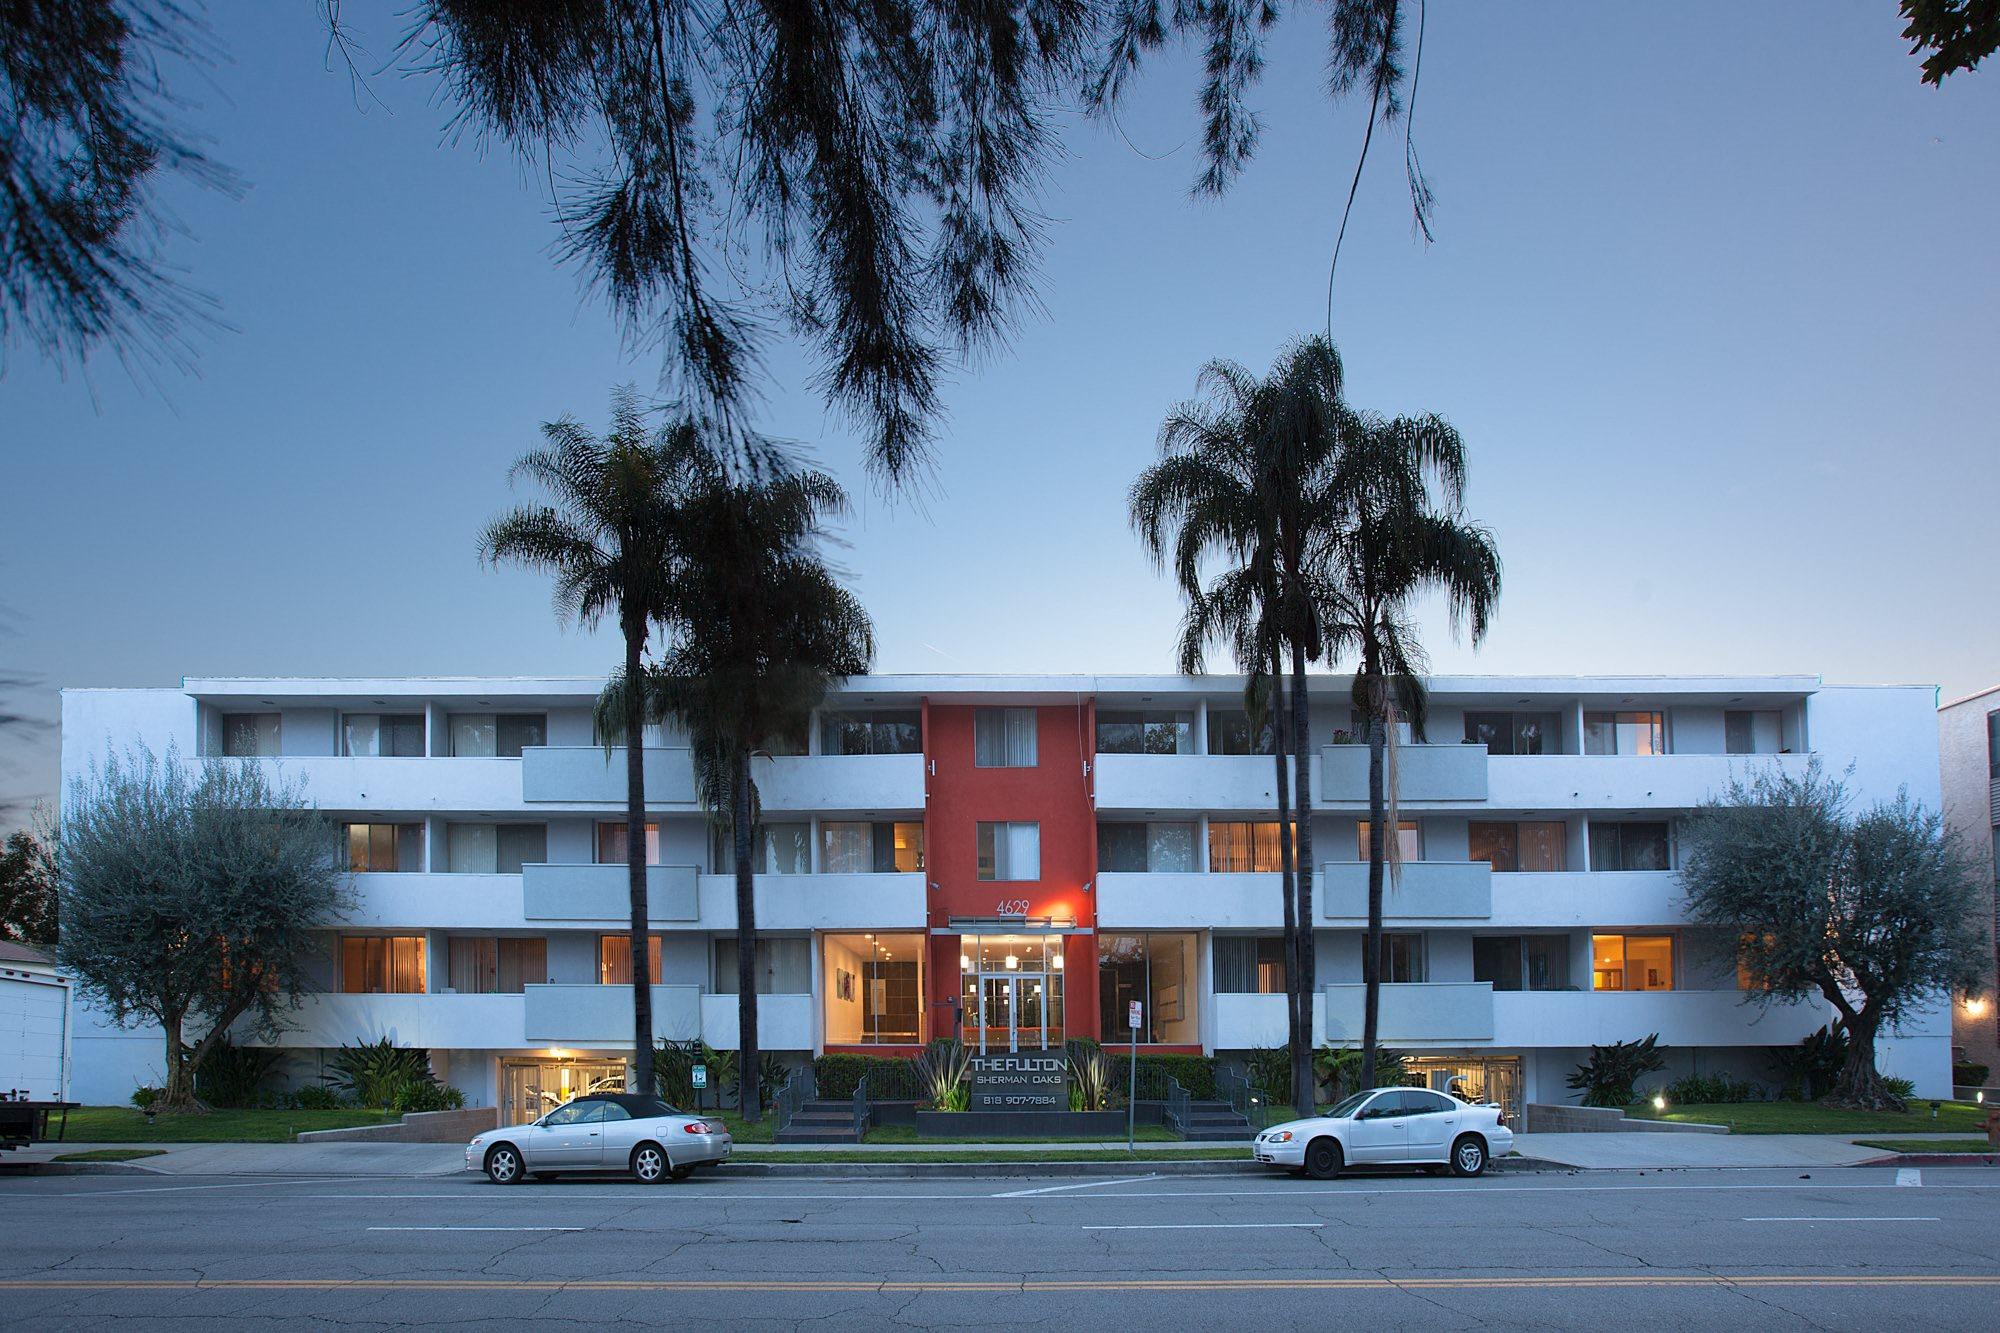 The Fulton Apartments in Sherman Oaks, Los Angeles, CA